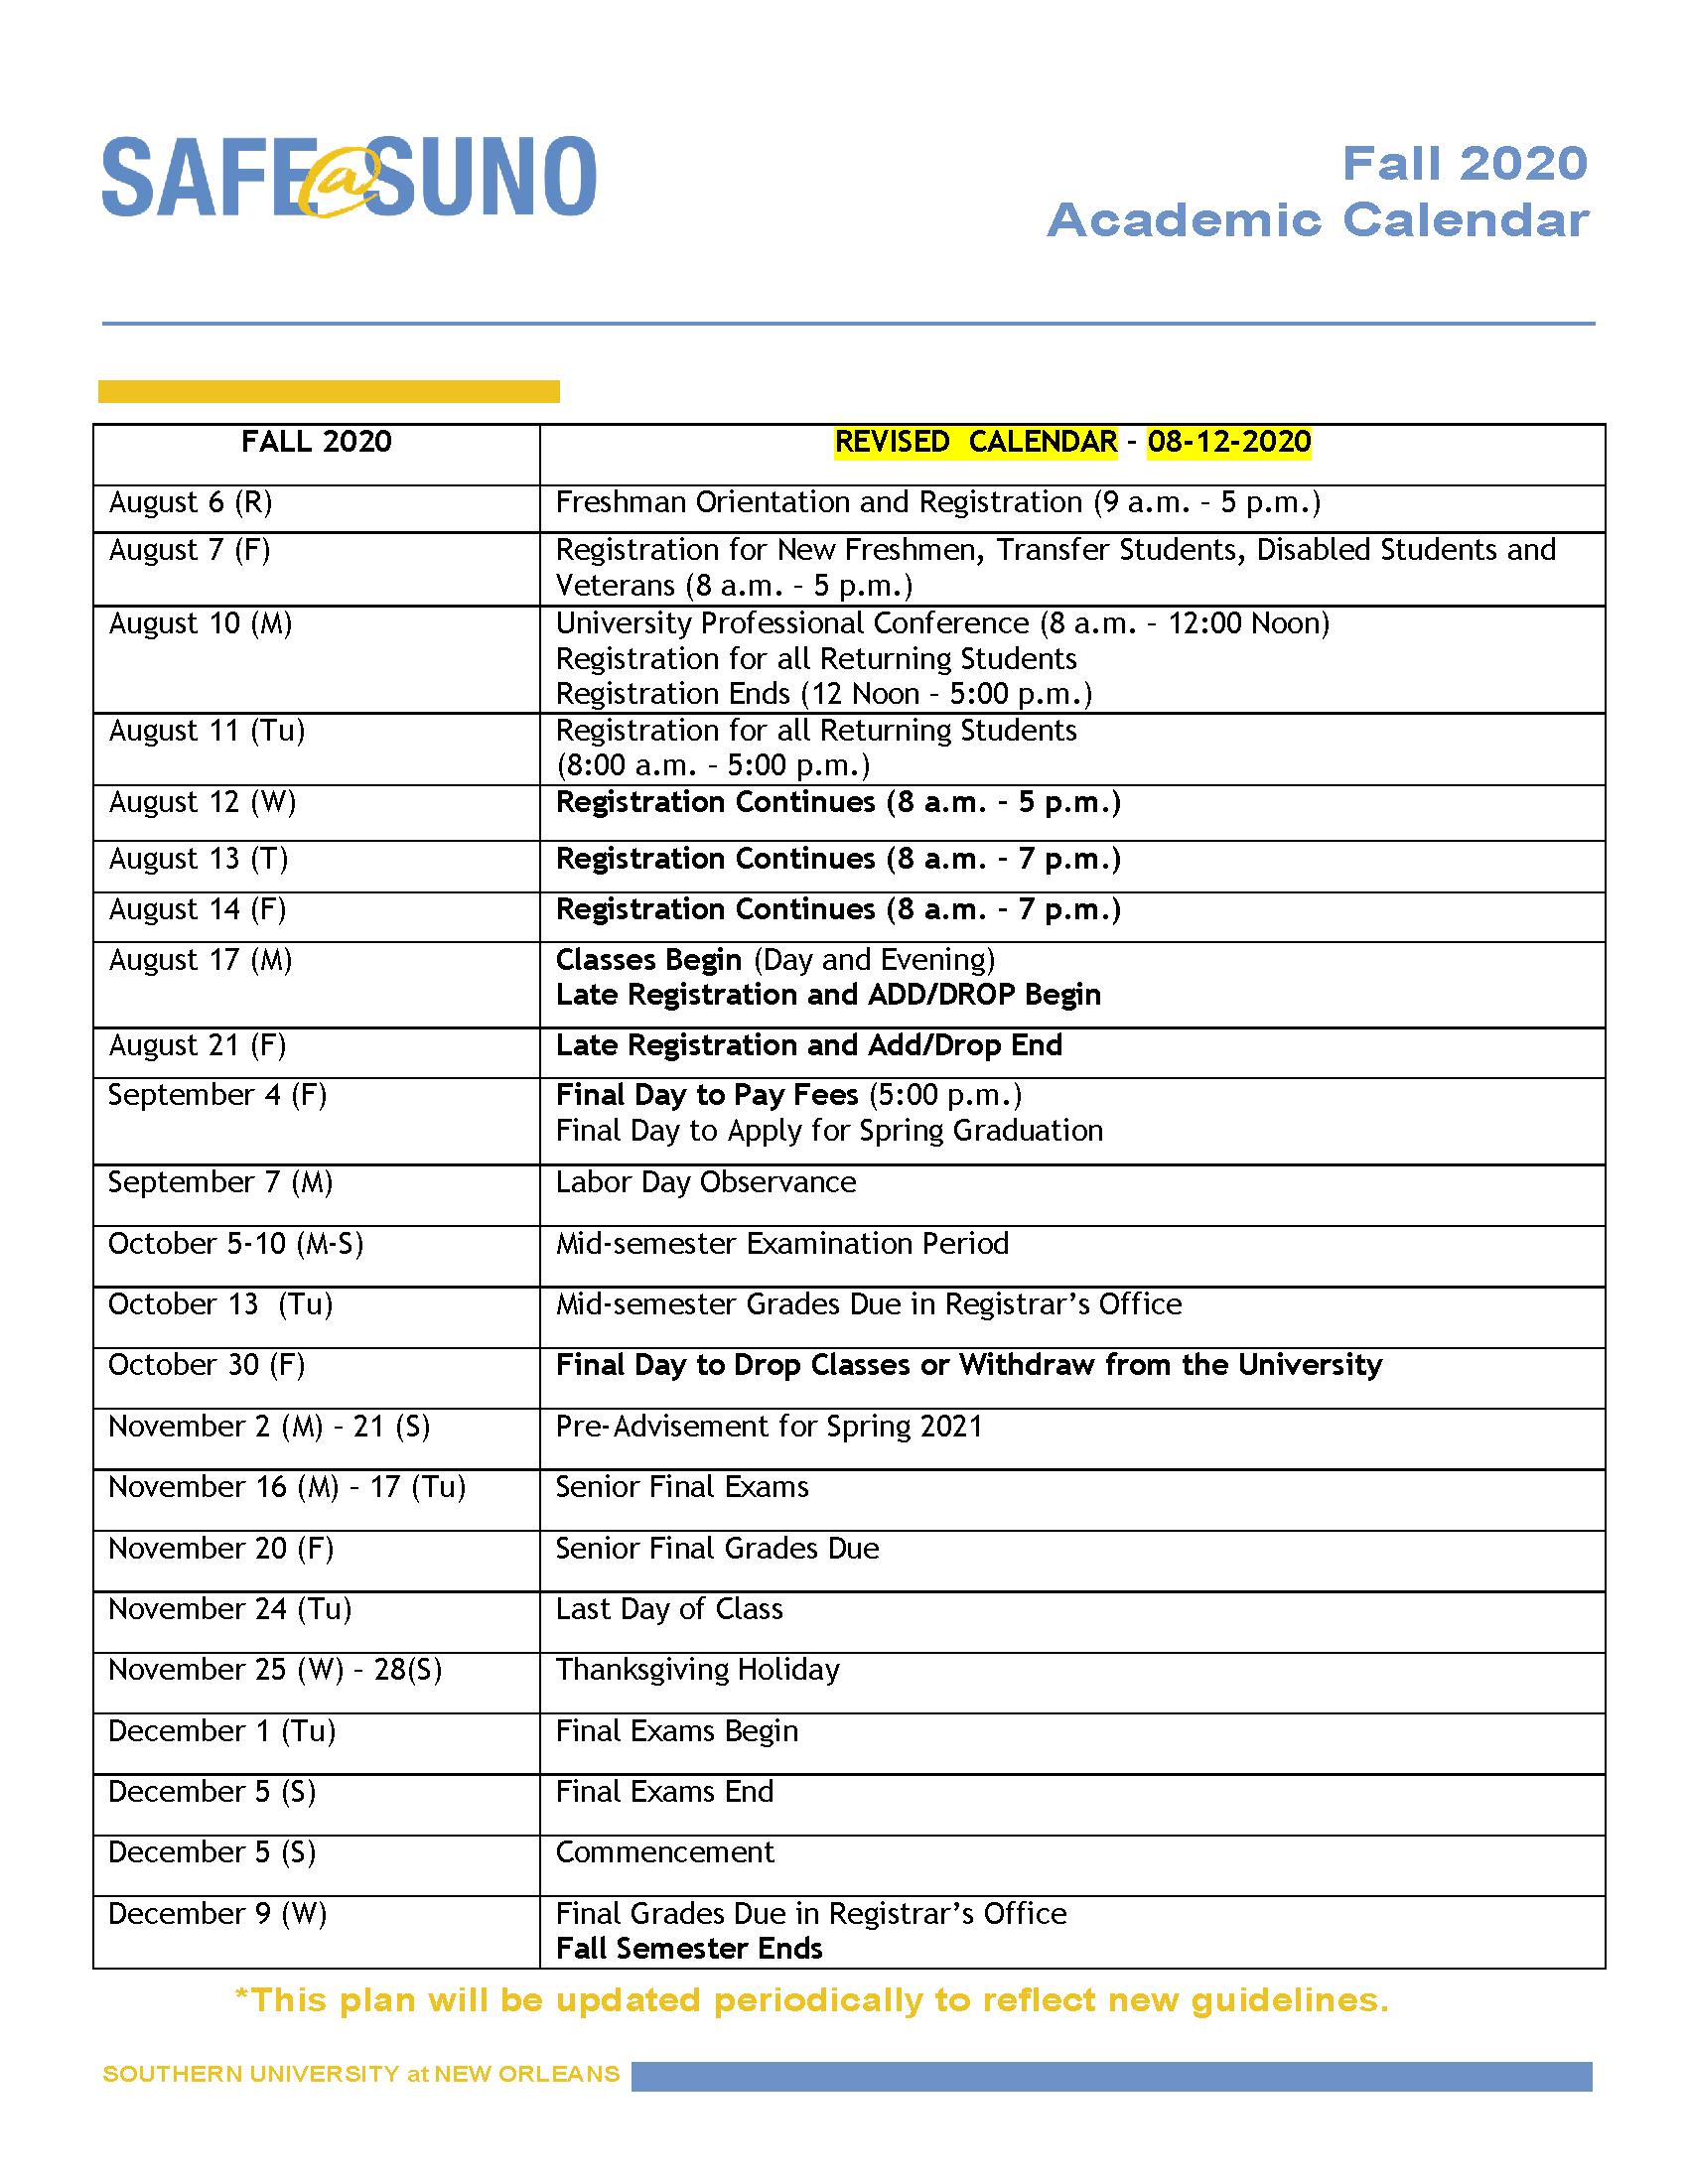 Sou Academic Calendar 2021-2022 Academic Calendars | Southern University at New Orleans